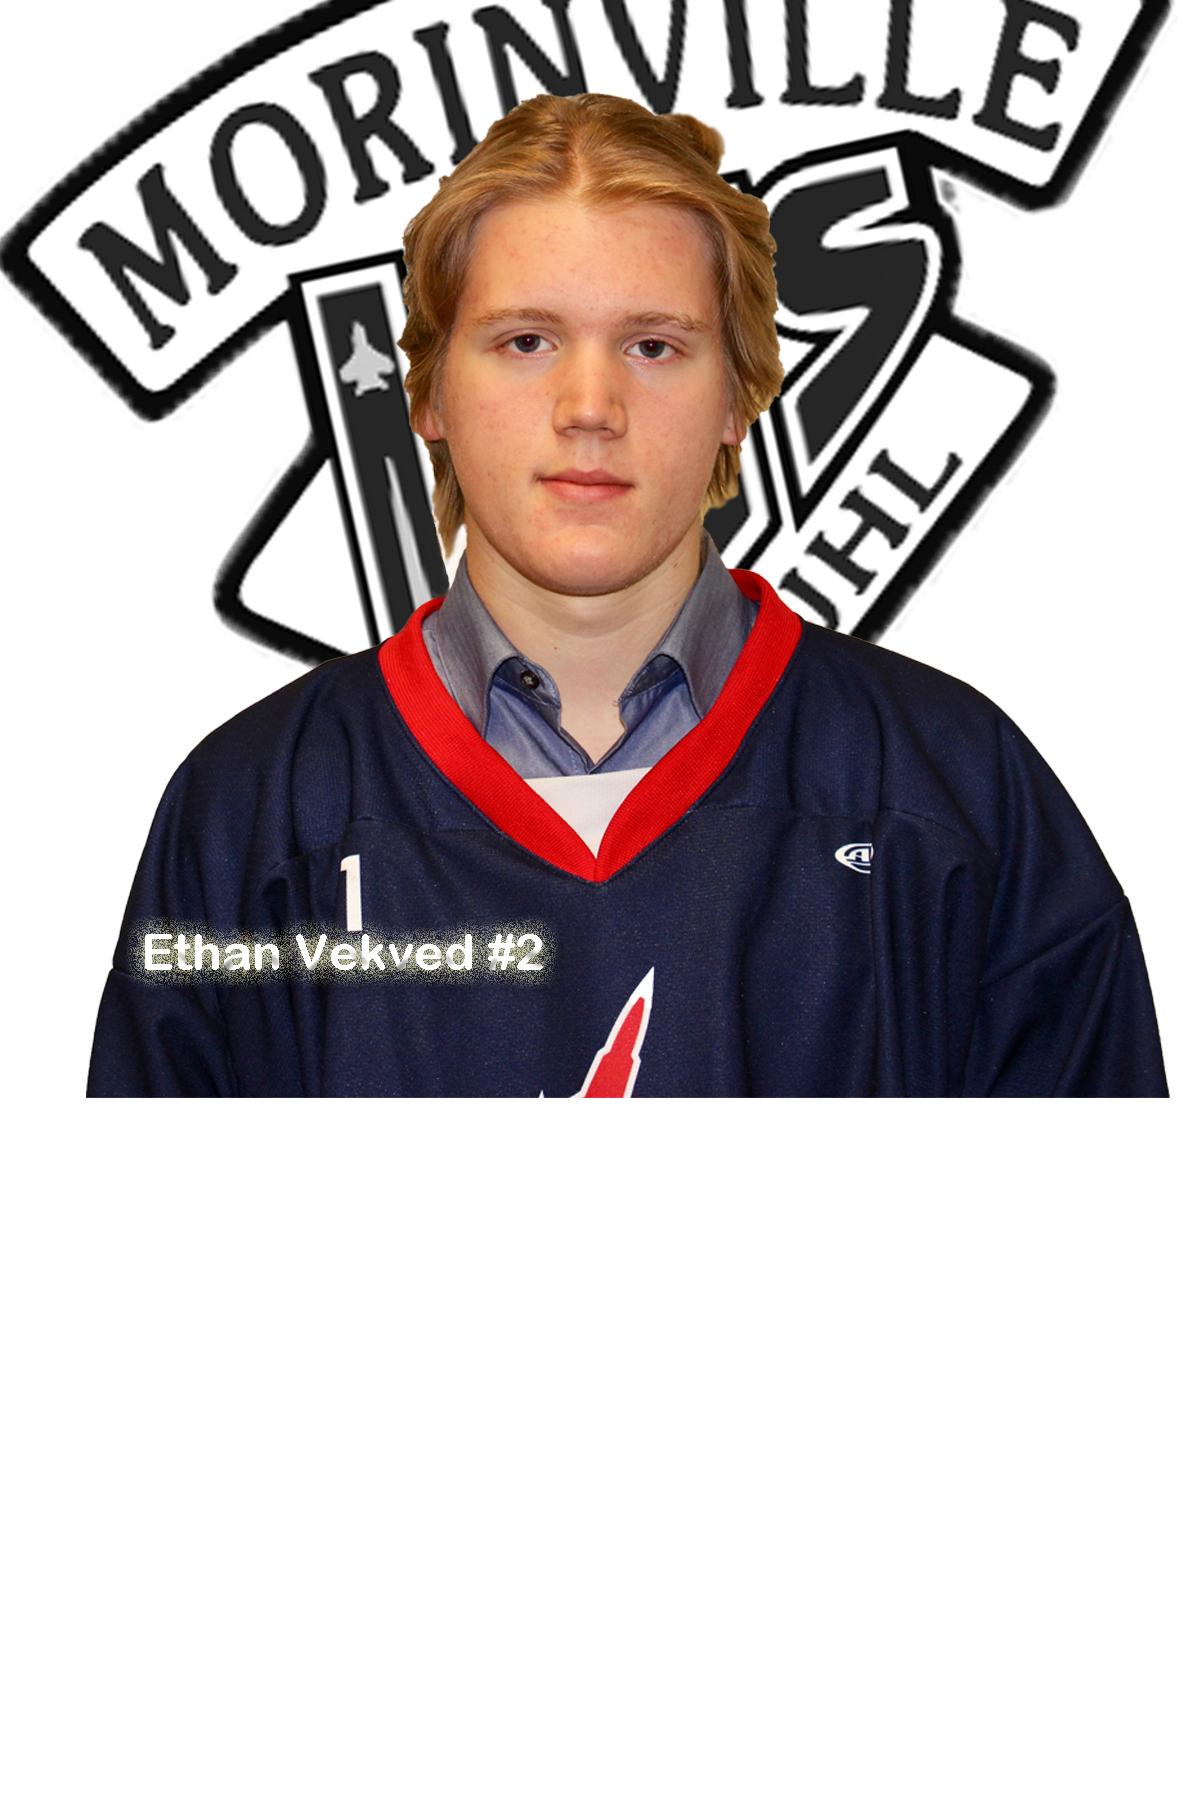 #2 Ethan Vekved